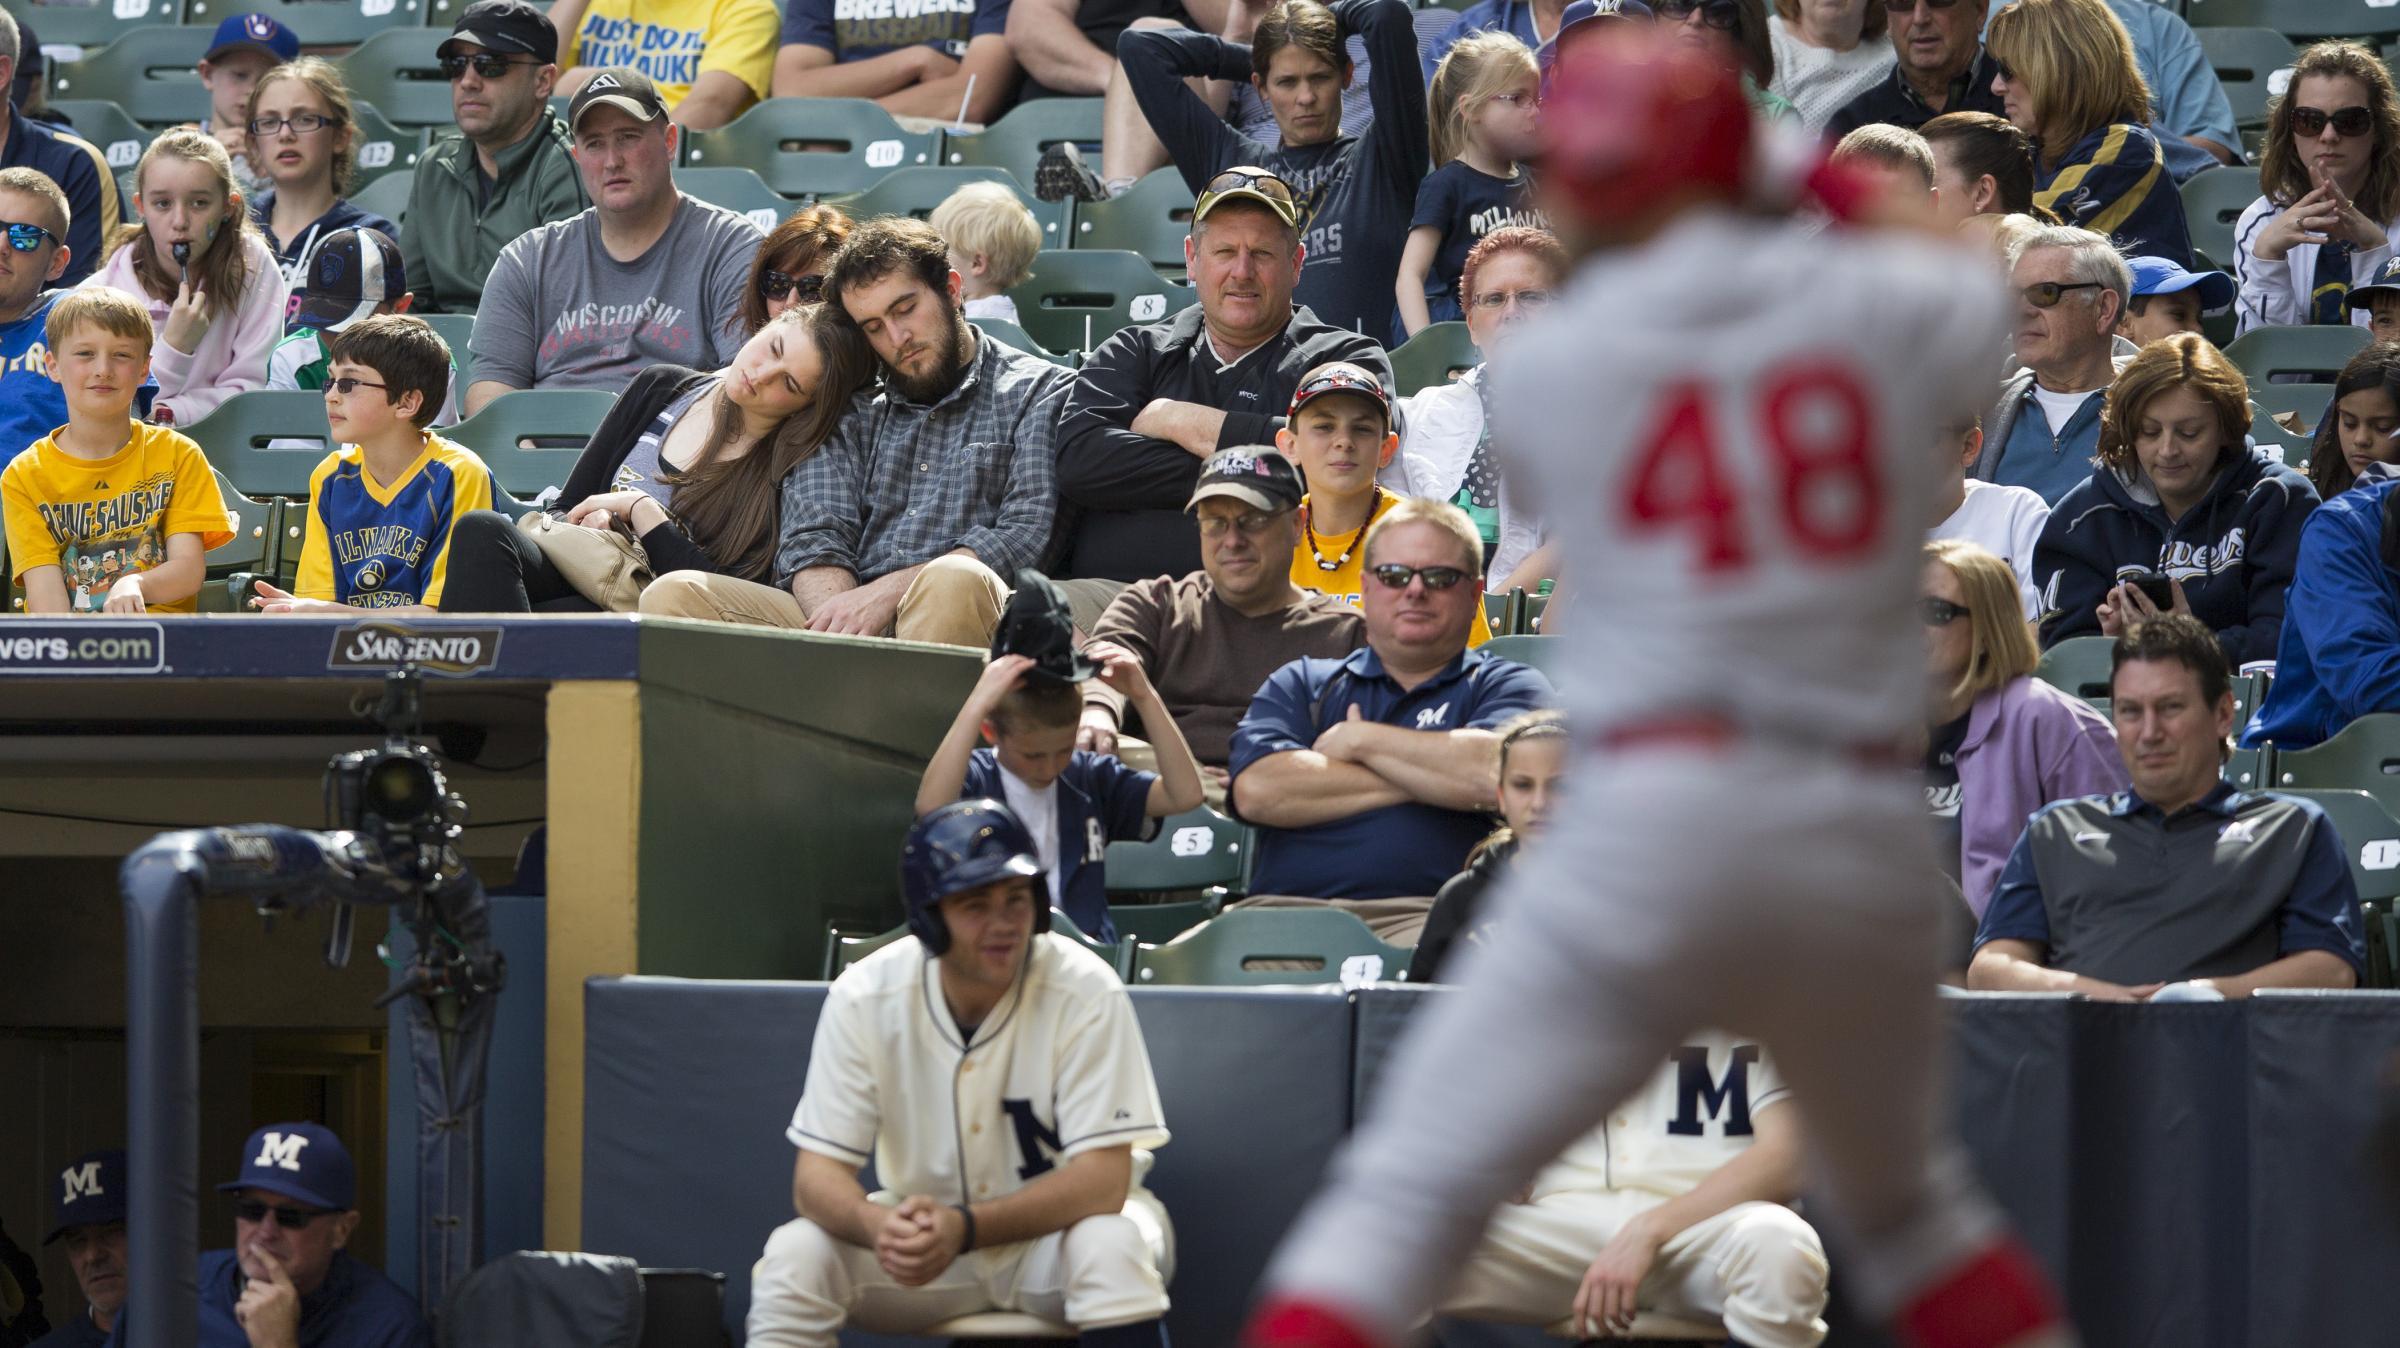 Essays Baseball Game